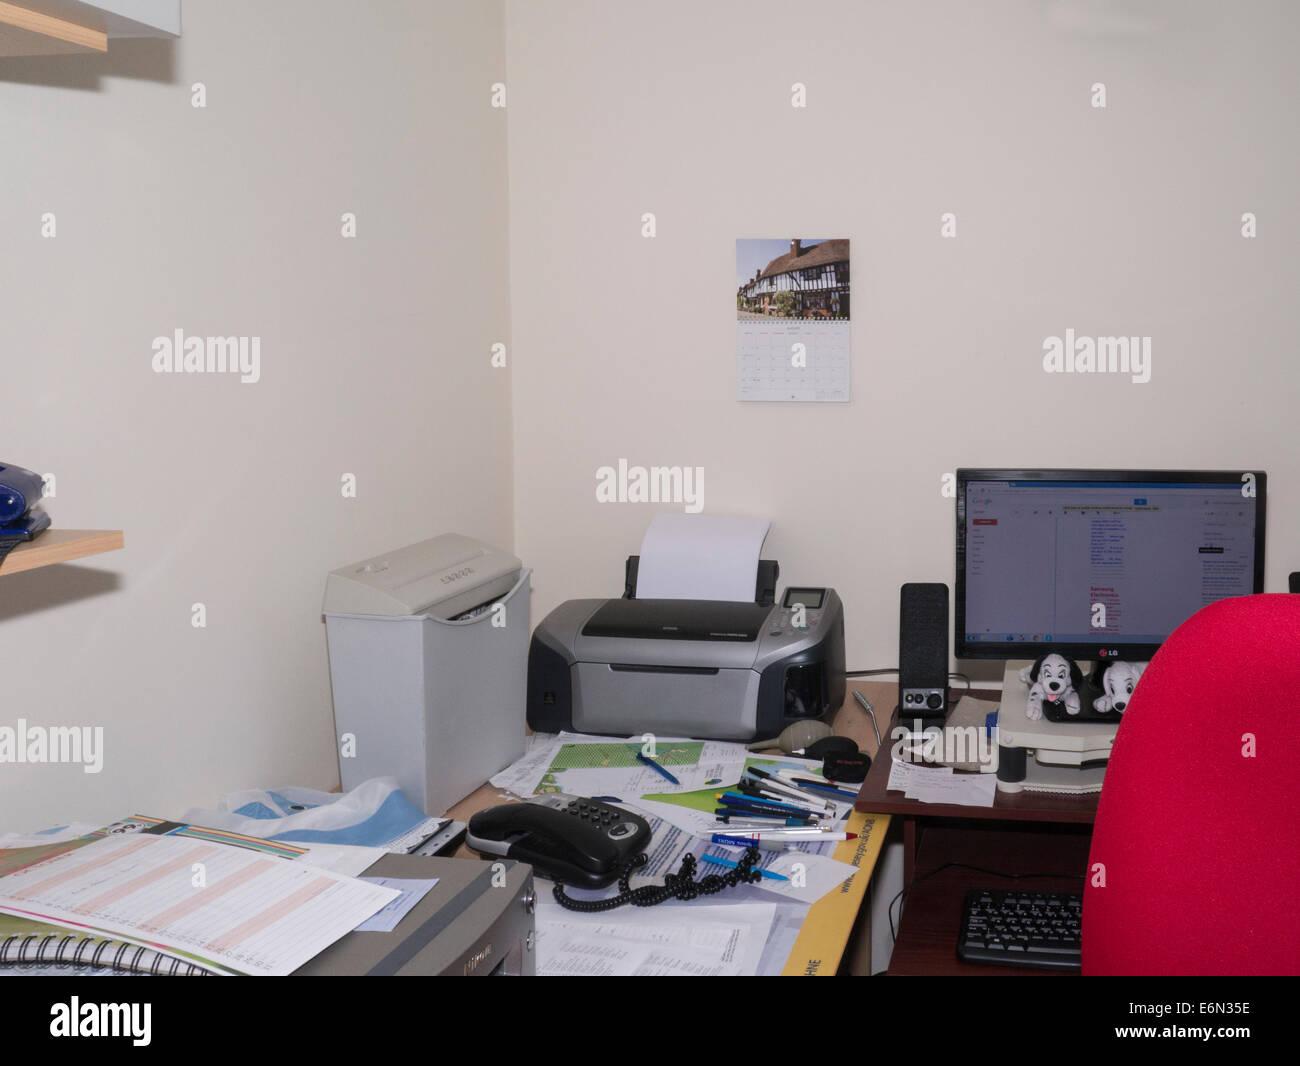 Home Printer Scanner Stock Photos & Home Printer Scanner Stock ...